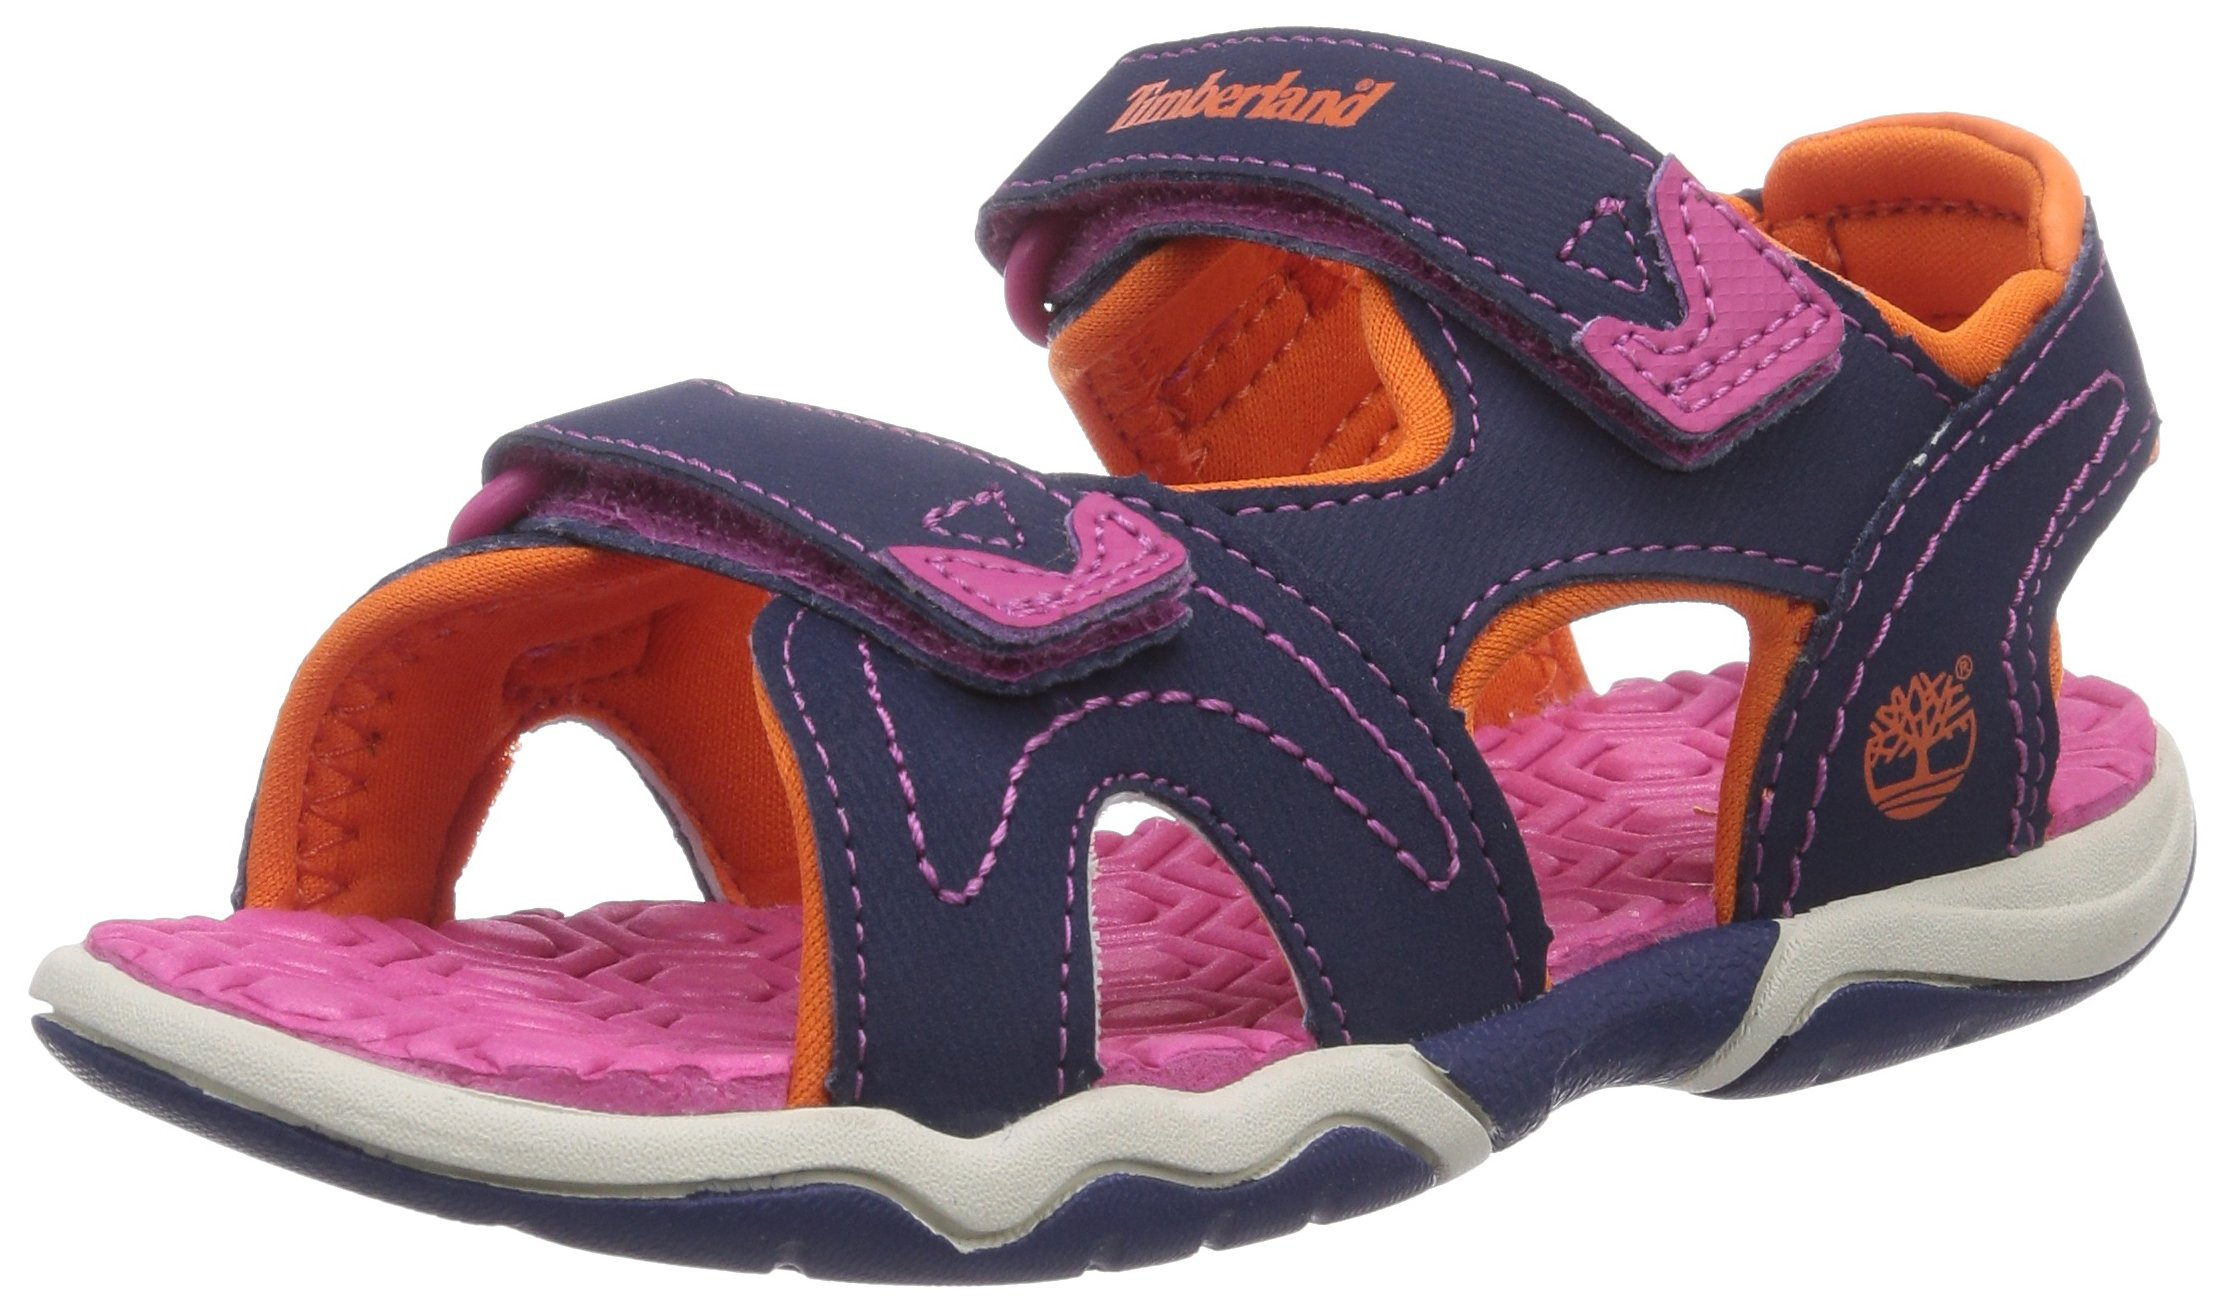 Timberland Adventure Seeker Two-Strap Sandal (Toddler/Little Kid),Navy/Pink/Orange,12 M US Little Kid by Timberland